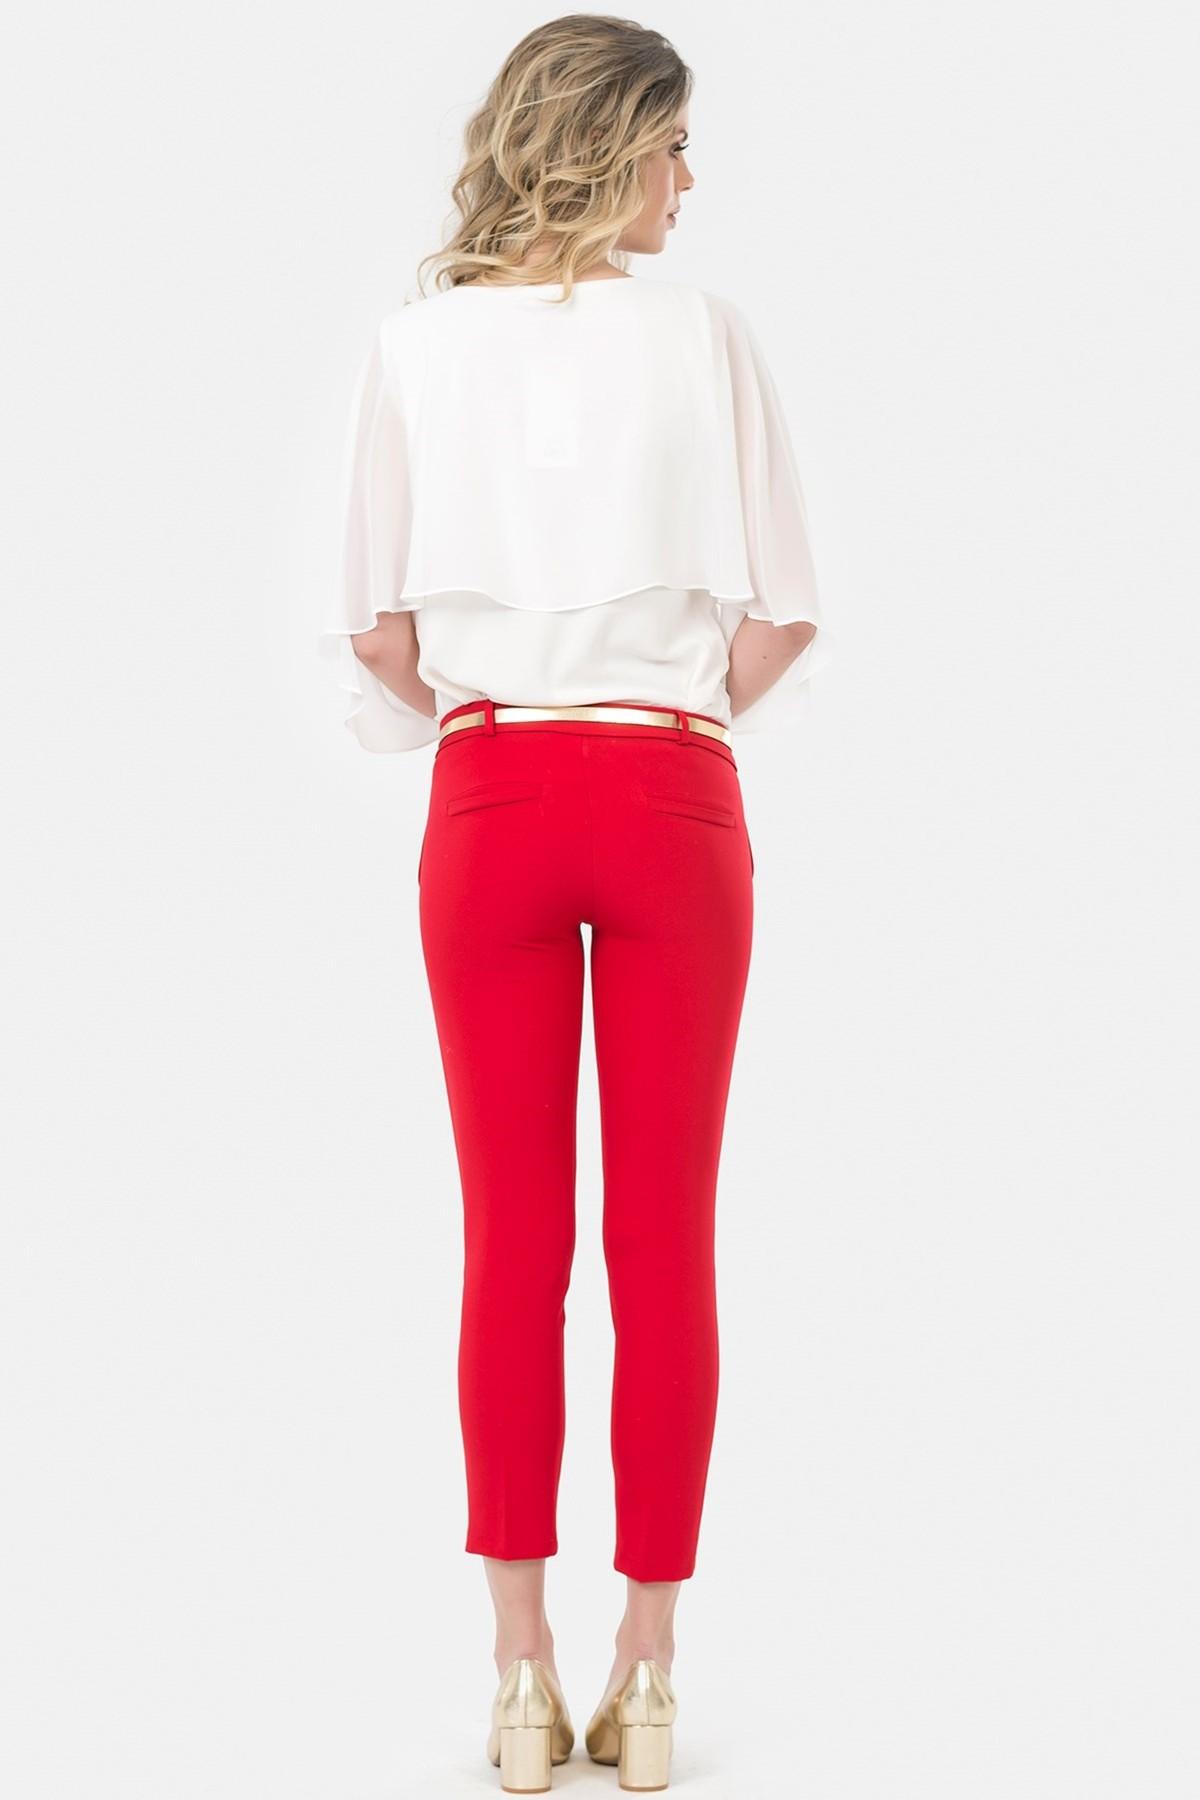 İroni Kadın Kırmızı Kemerli Dar Paça Pantolon 1581-891A 2